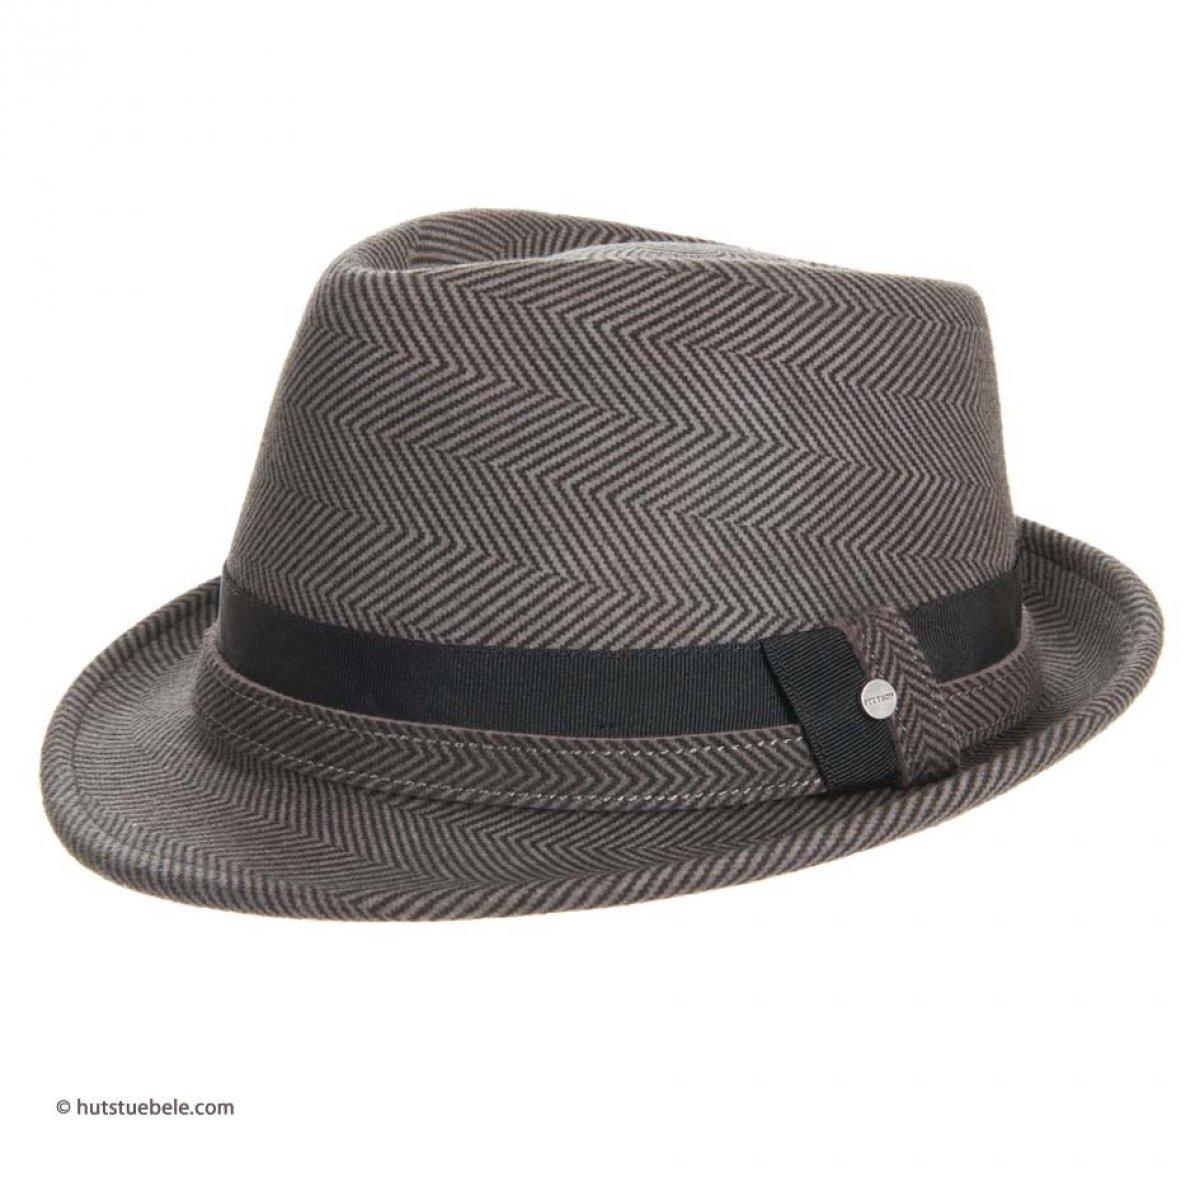 mans hat Trilby Randolph by Stetson c3f97cebb09